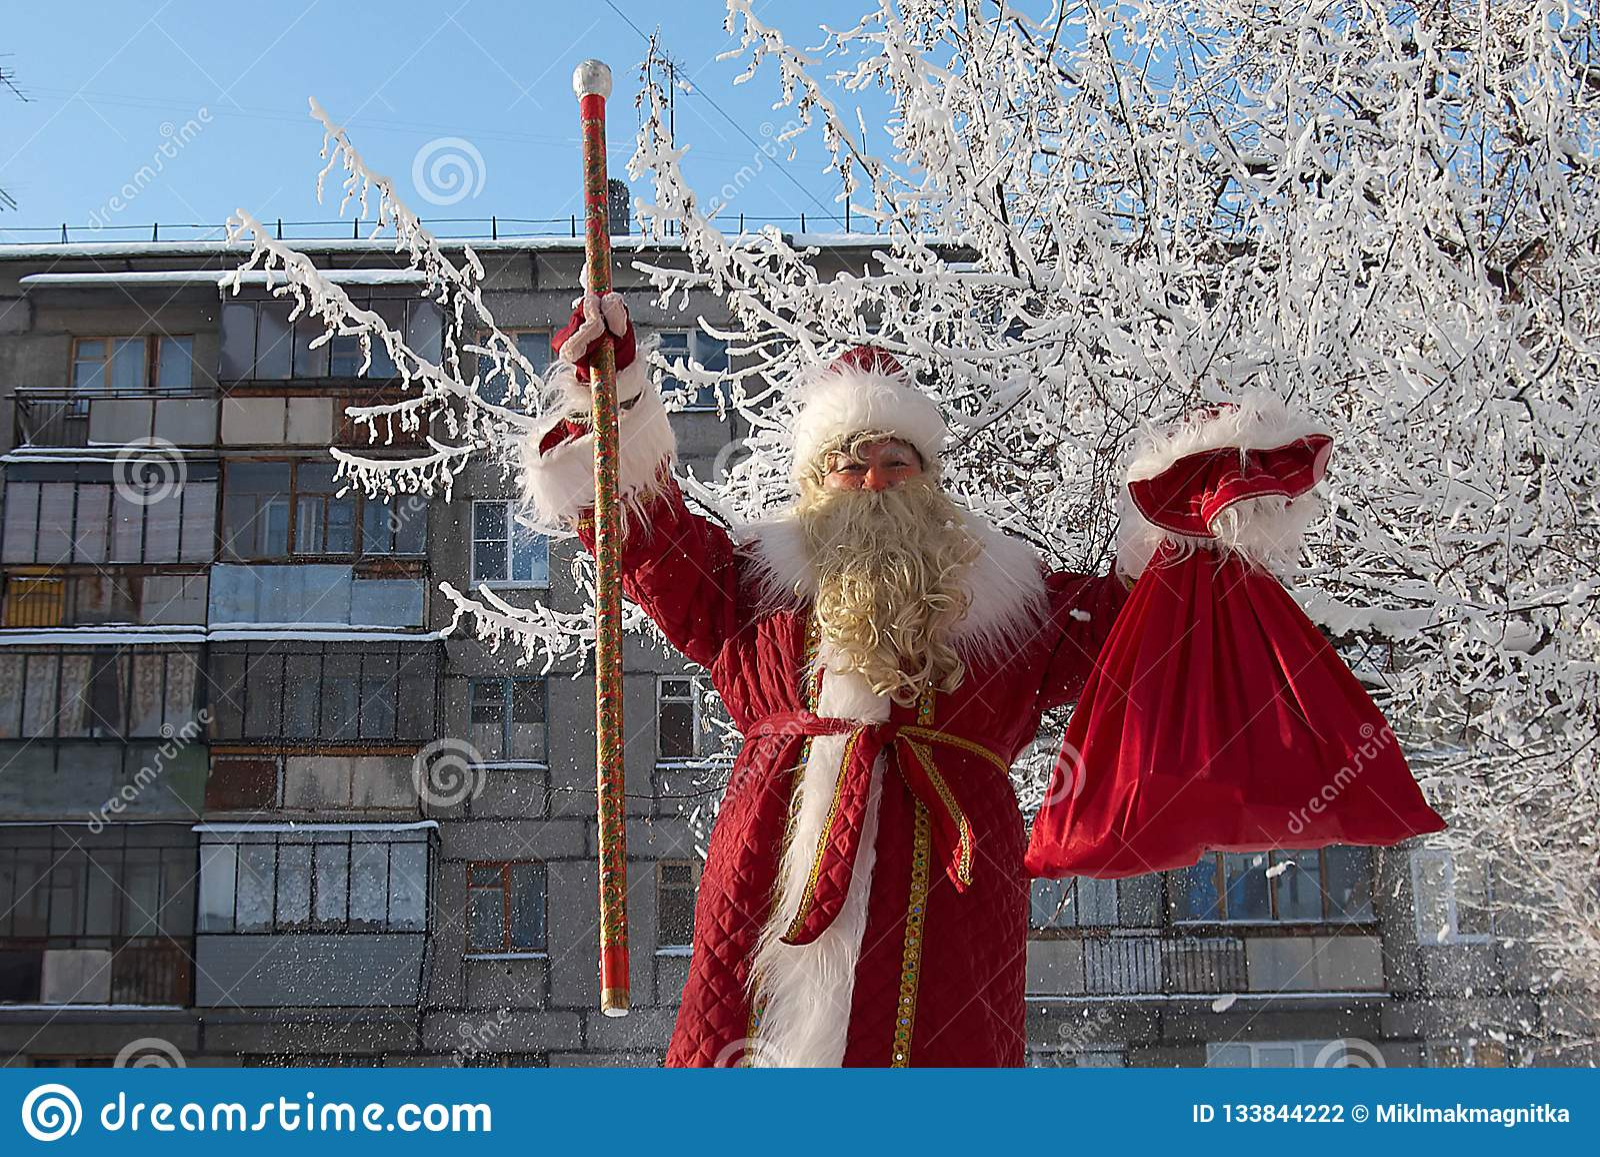 Russia, city of Magnitogorsk, - January, 3, 2012. Slavic Santa